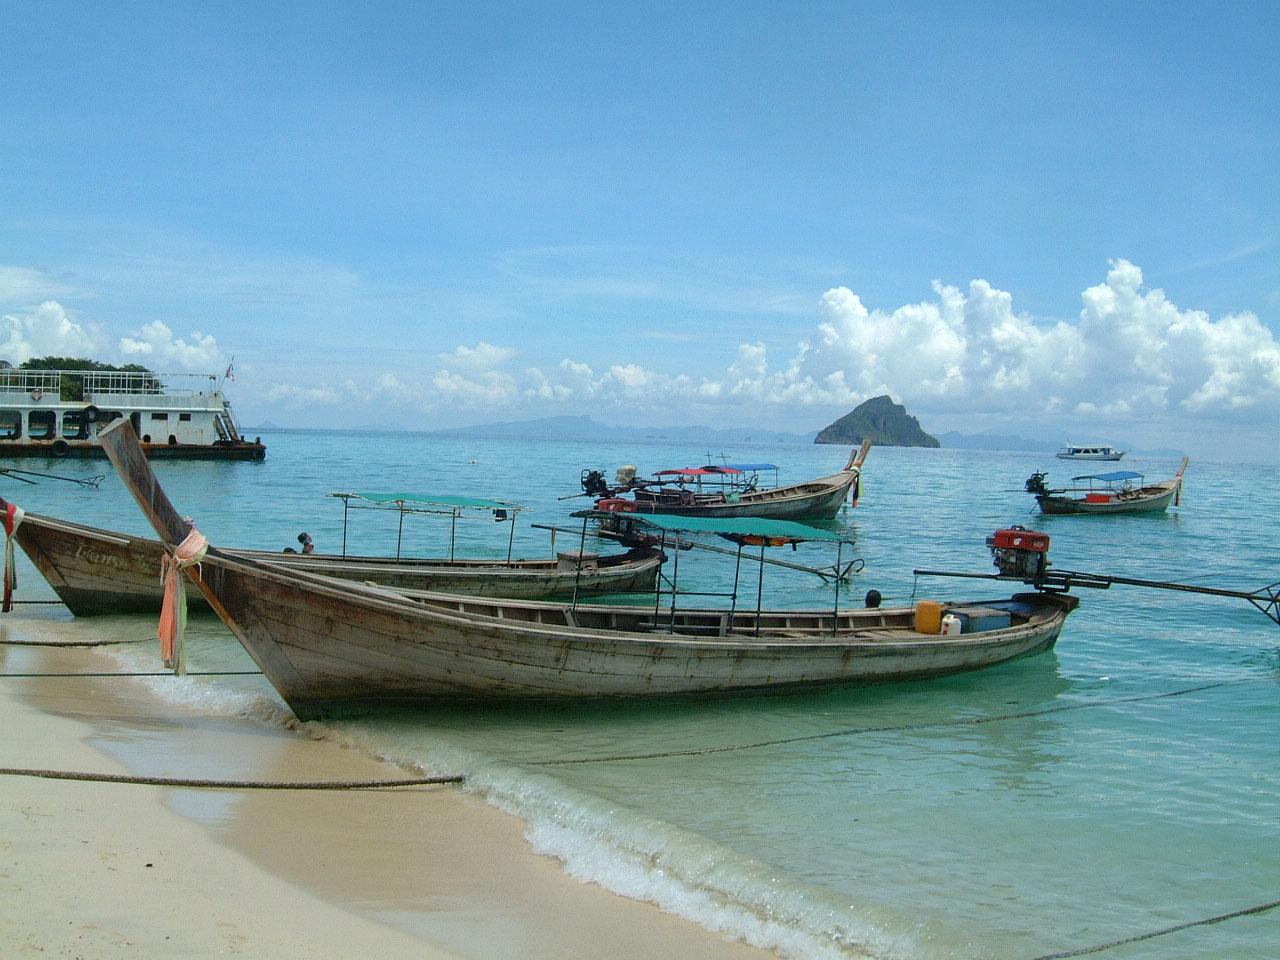 Thailand Phi Phi Island panoramic scenes Mar 2003 05